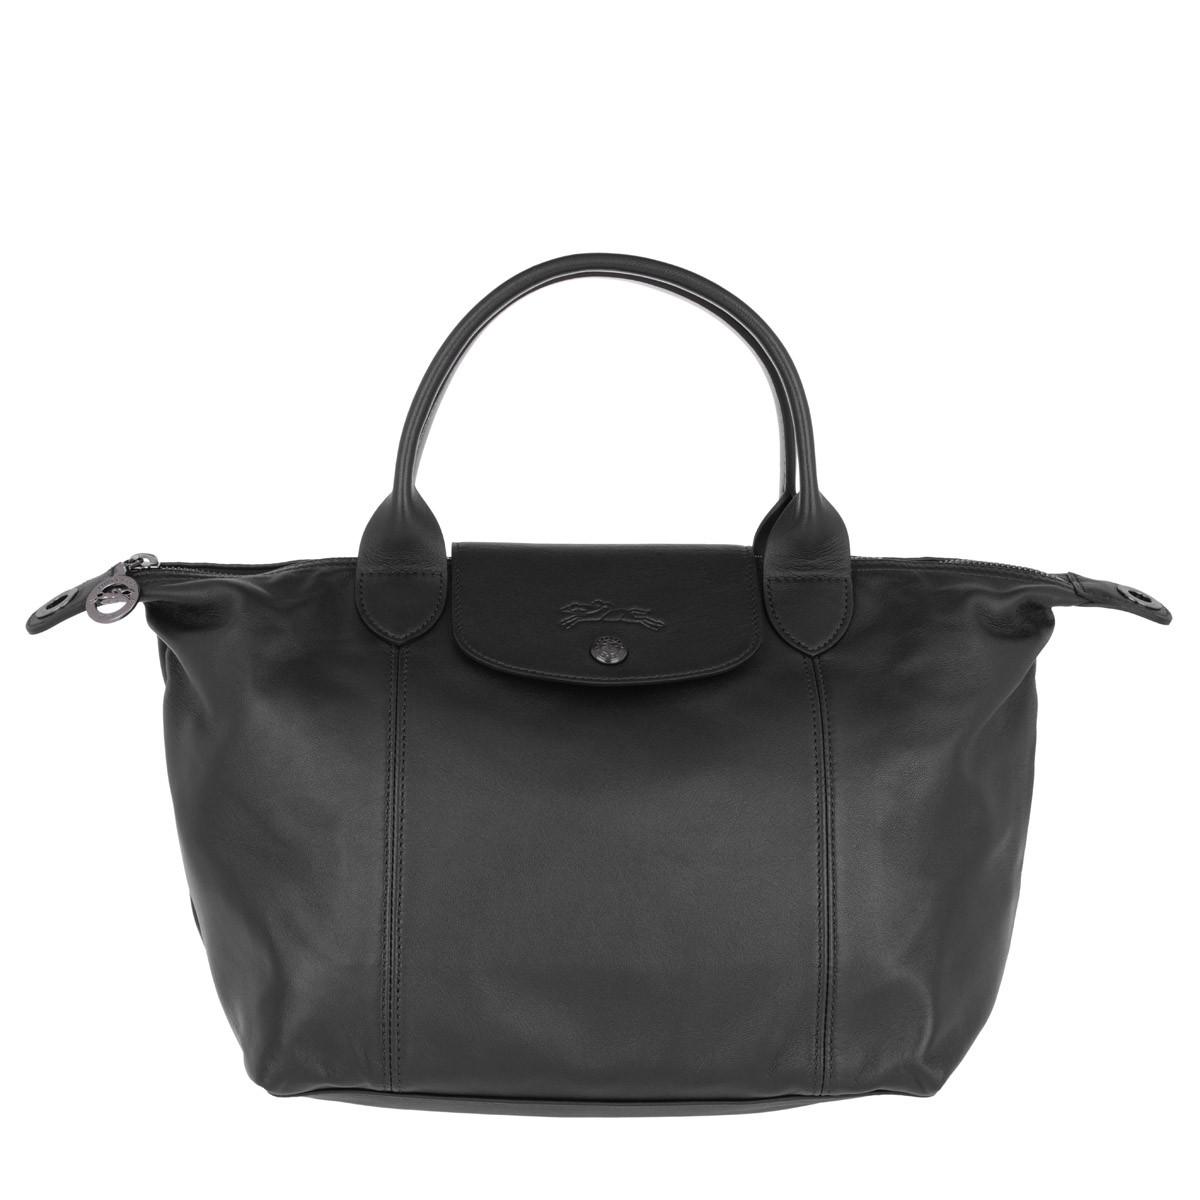 Longchamp Tote - Le Pliage S Leather Black - in schwarz - für Damen